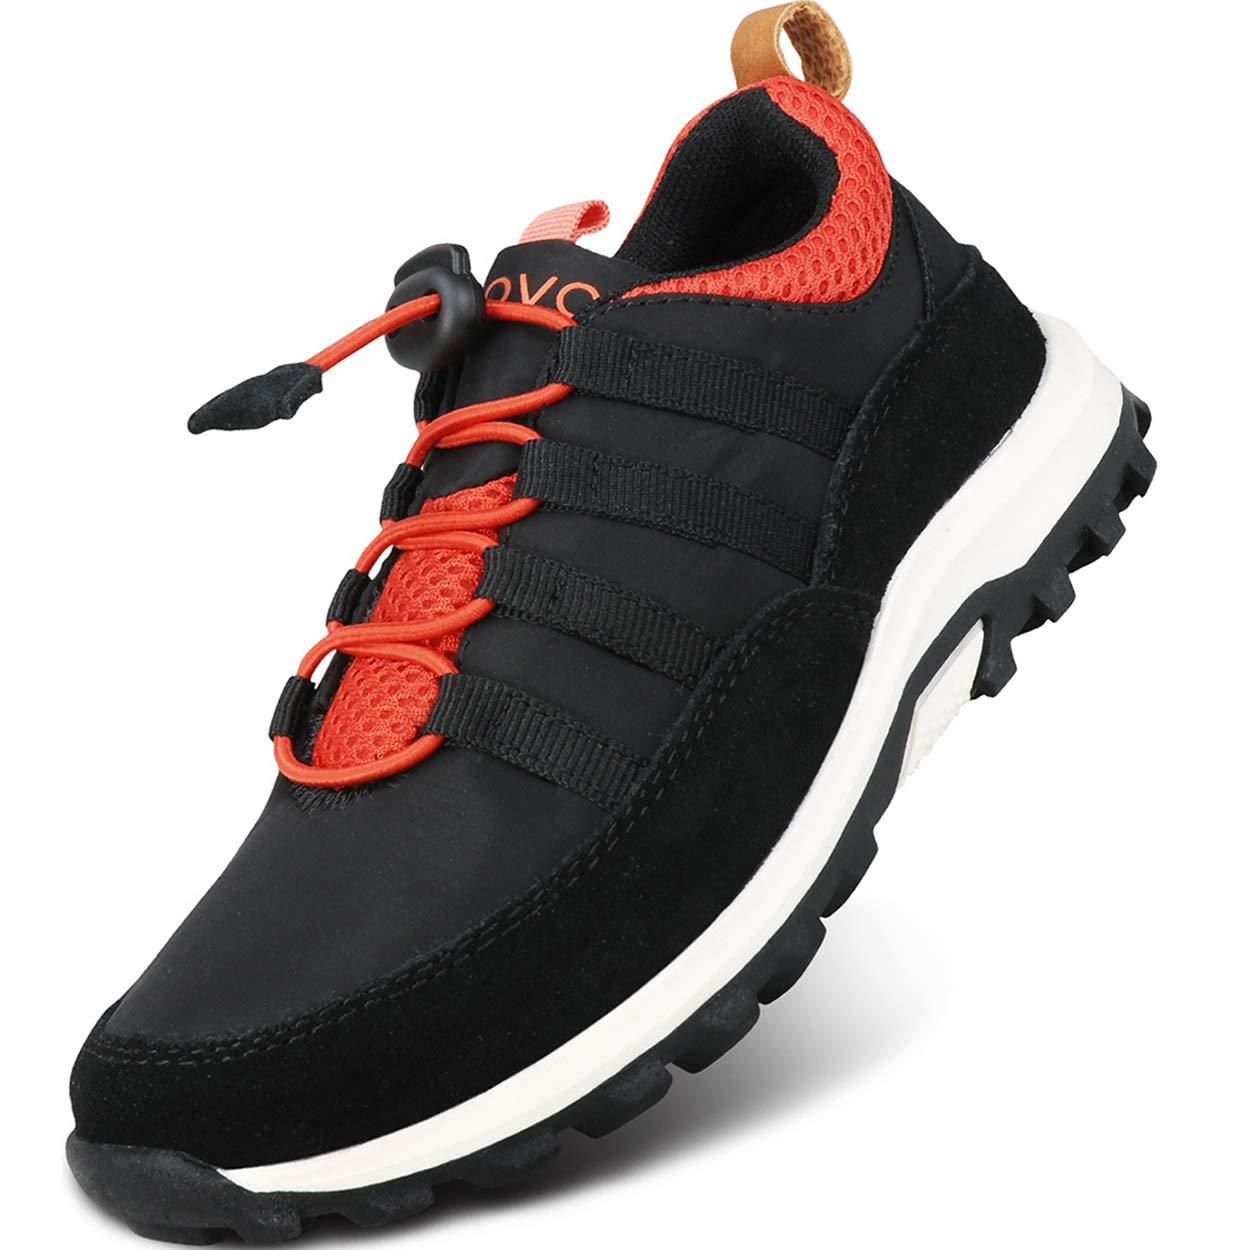 UOVO Boys Shoes Boys Running Sneakers Tennis Hiking Shoes Kids Athletic Outdoor Sneakers Slip Resistant(Little Boys/Big Boys) (3.5 M US Big Kid, Black)